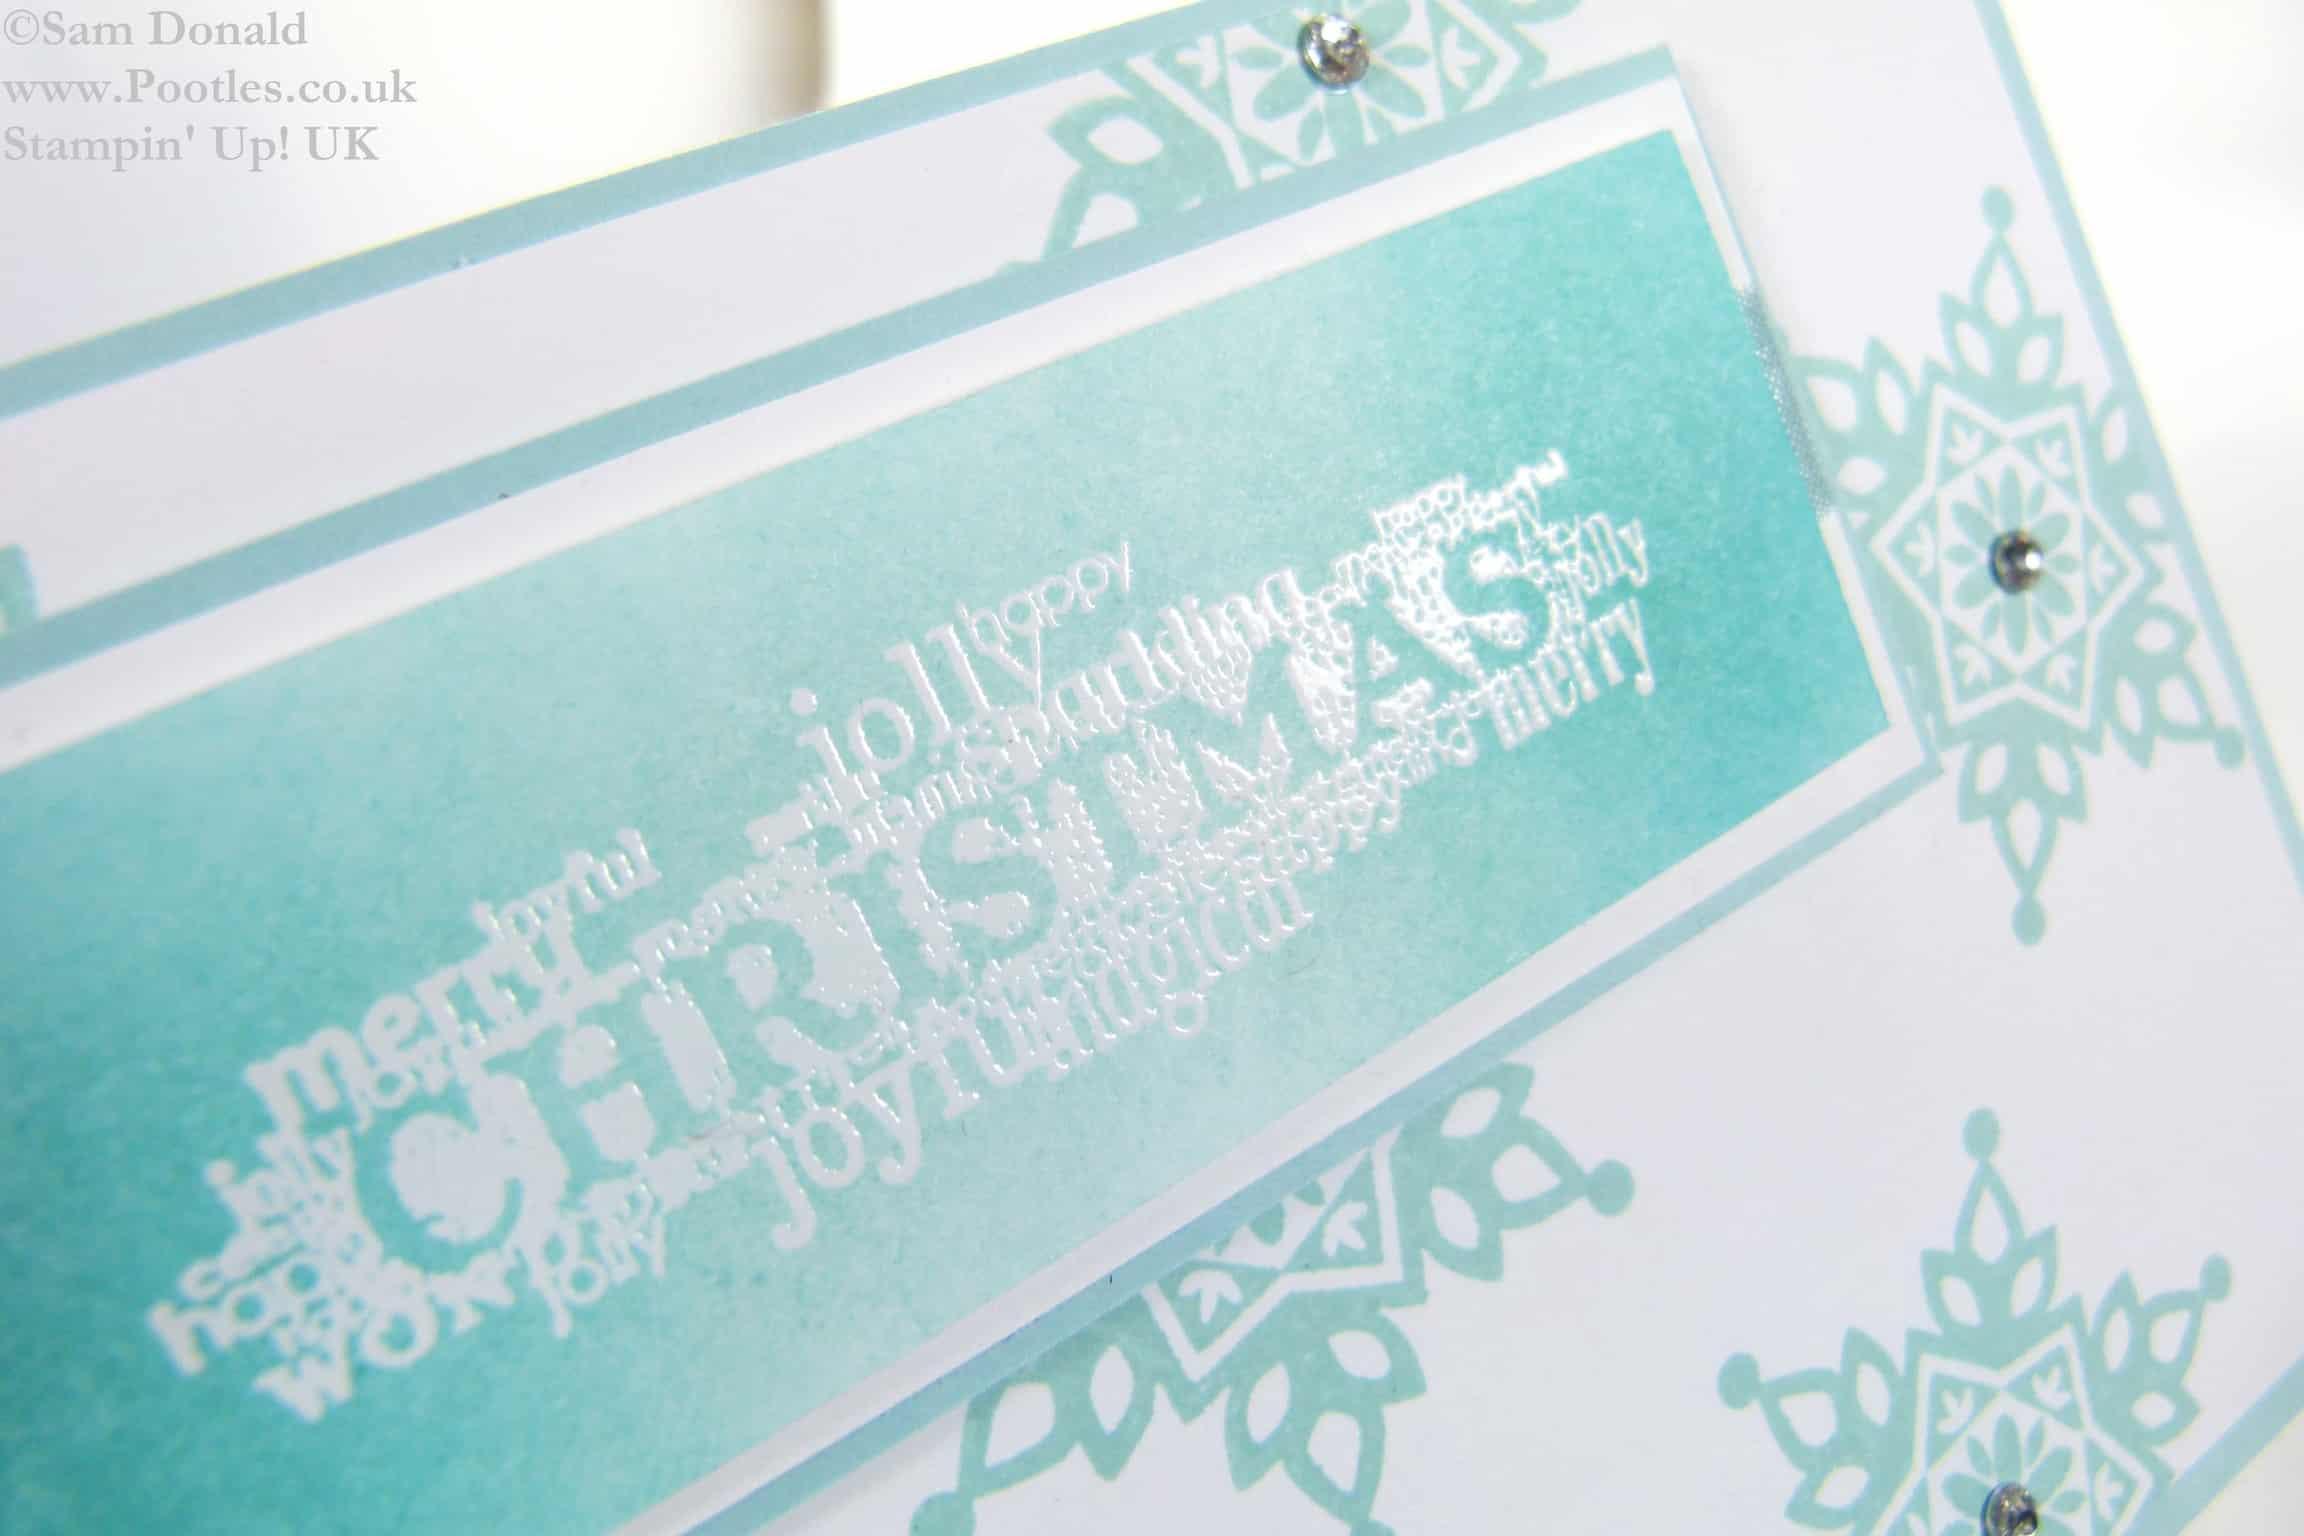 Pootles Stampin Up UK Emboss Resist Seasonal Christmas 2